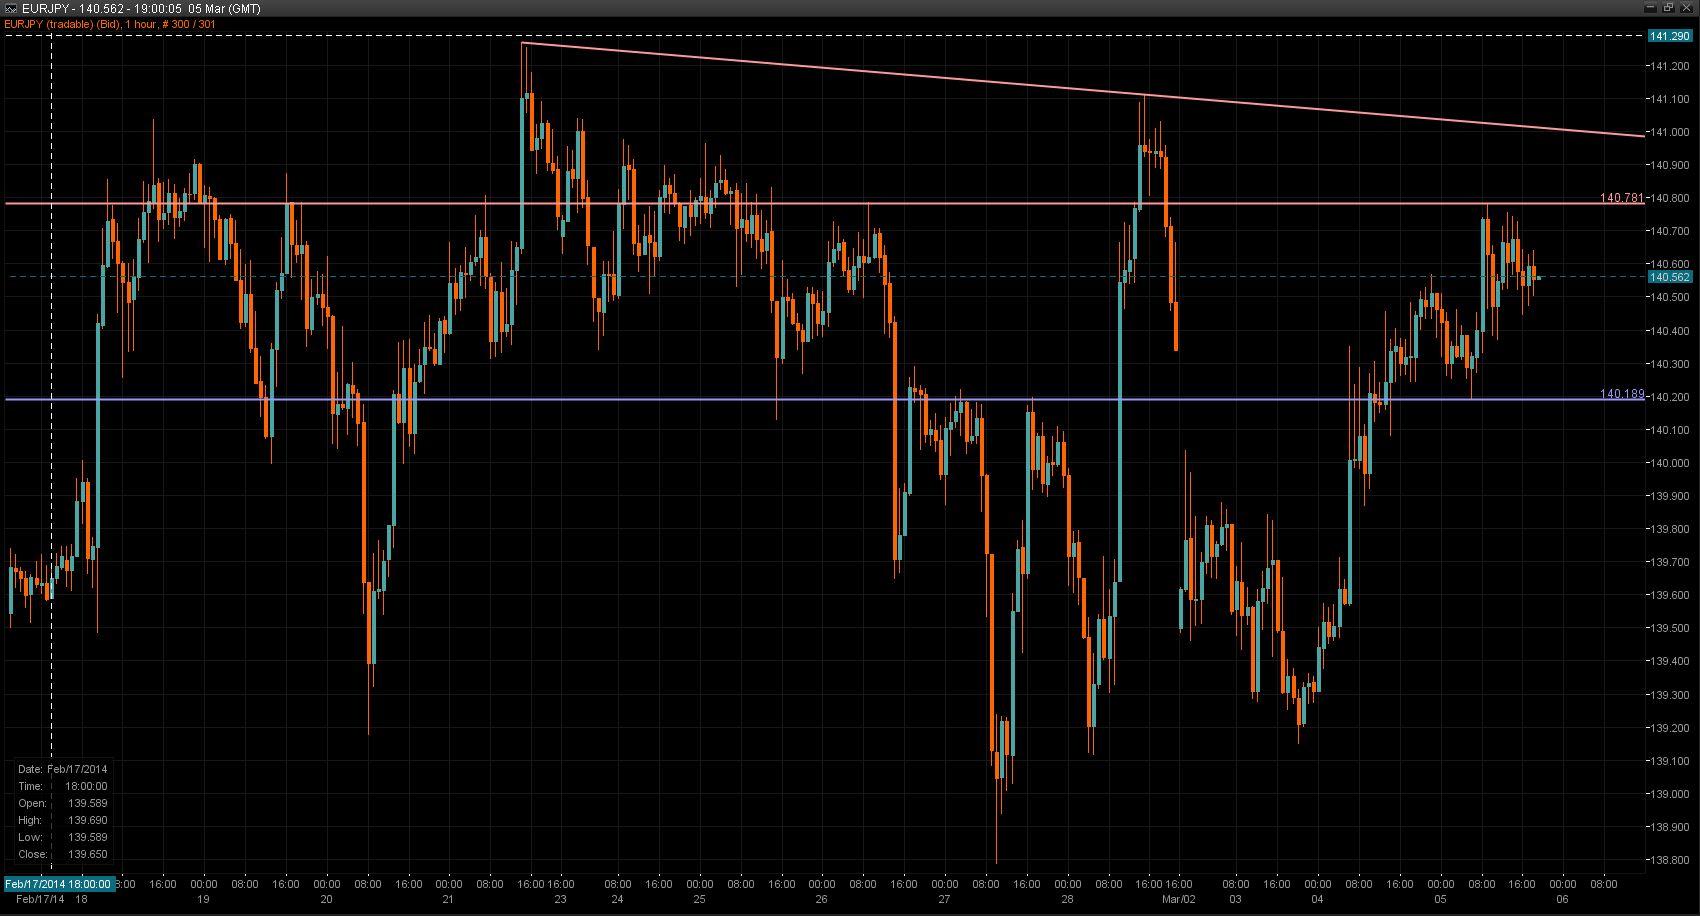 EUR/JPY Chart 05 Mar 2014